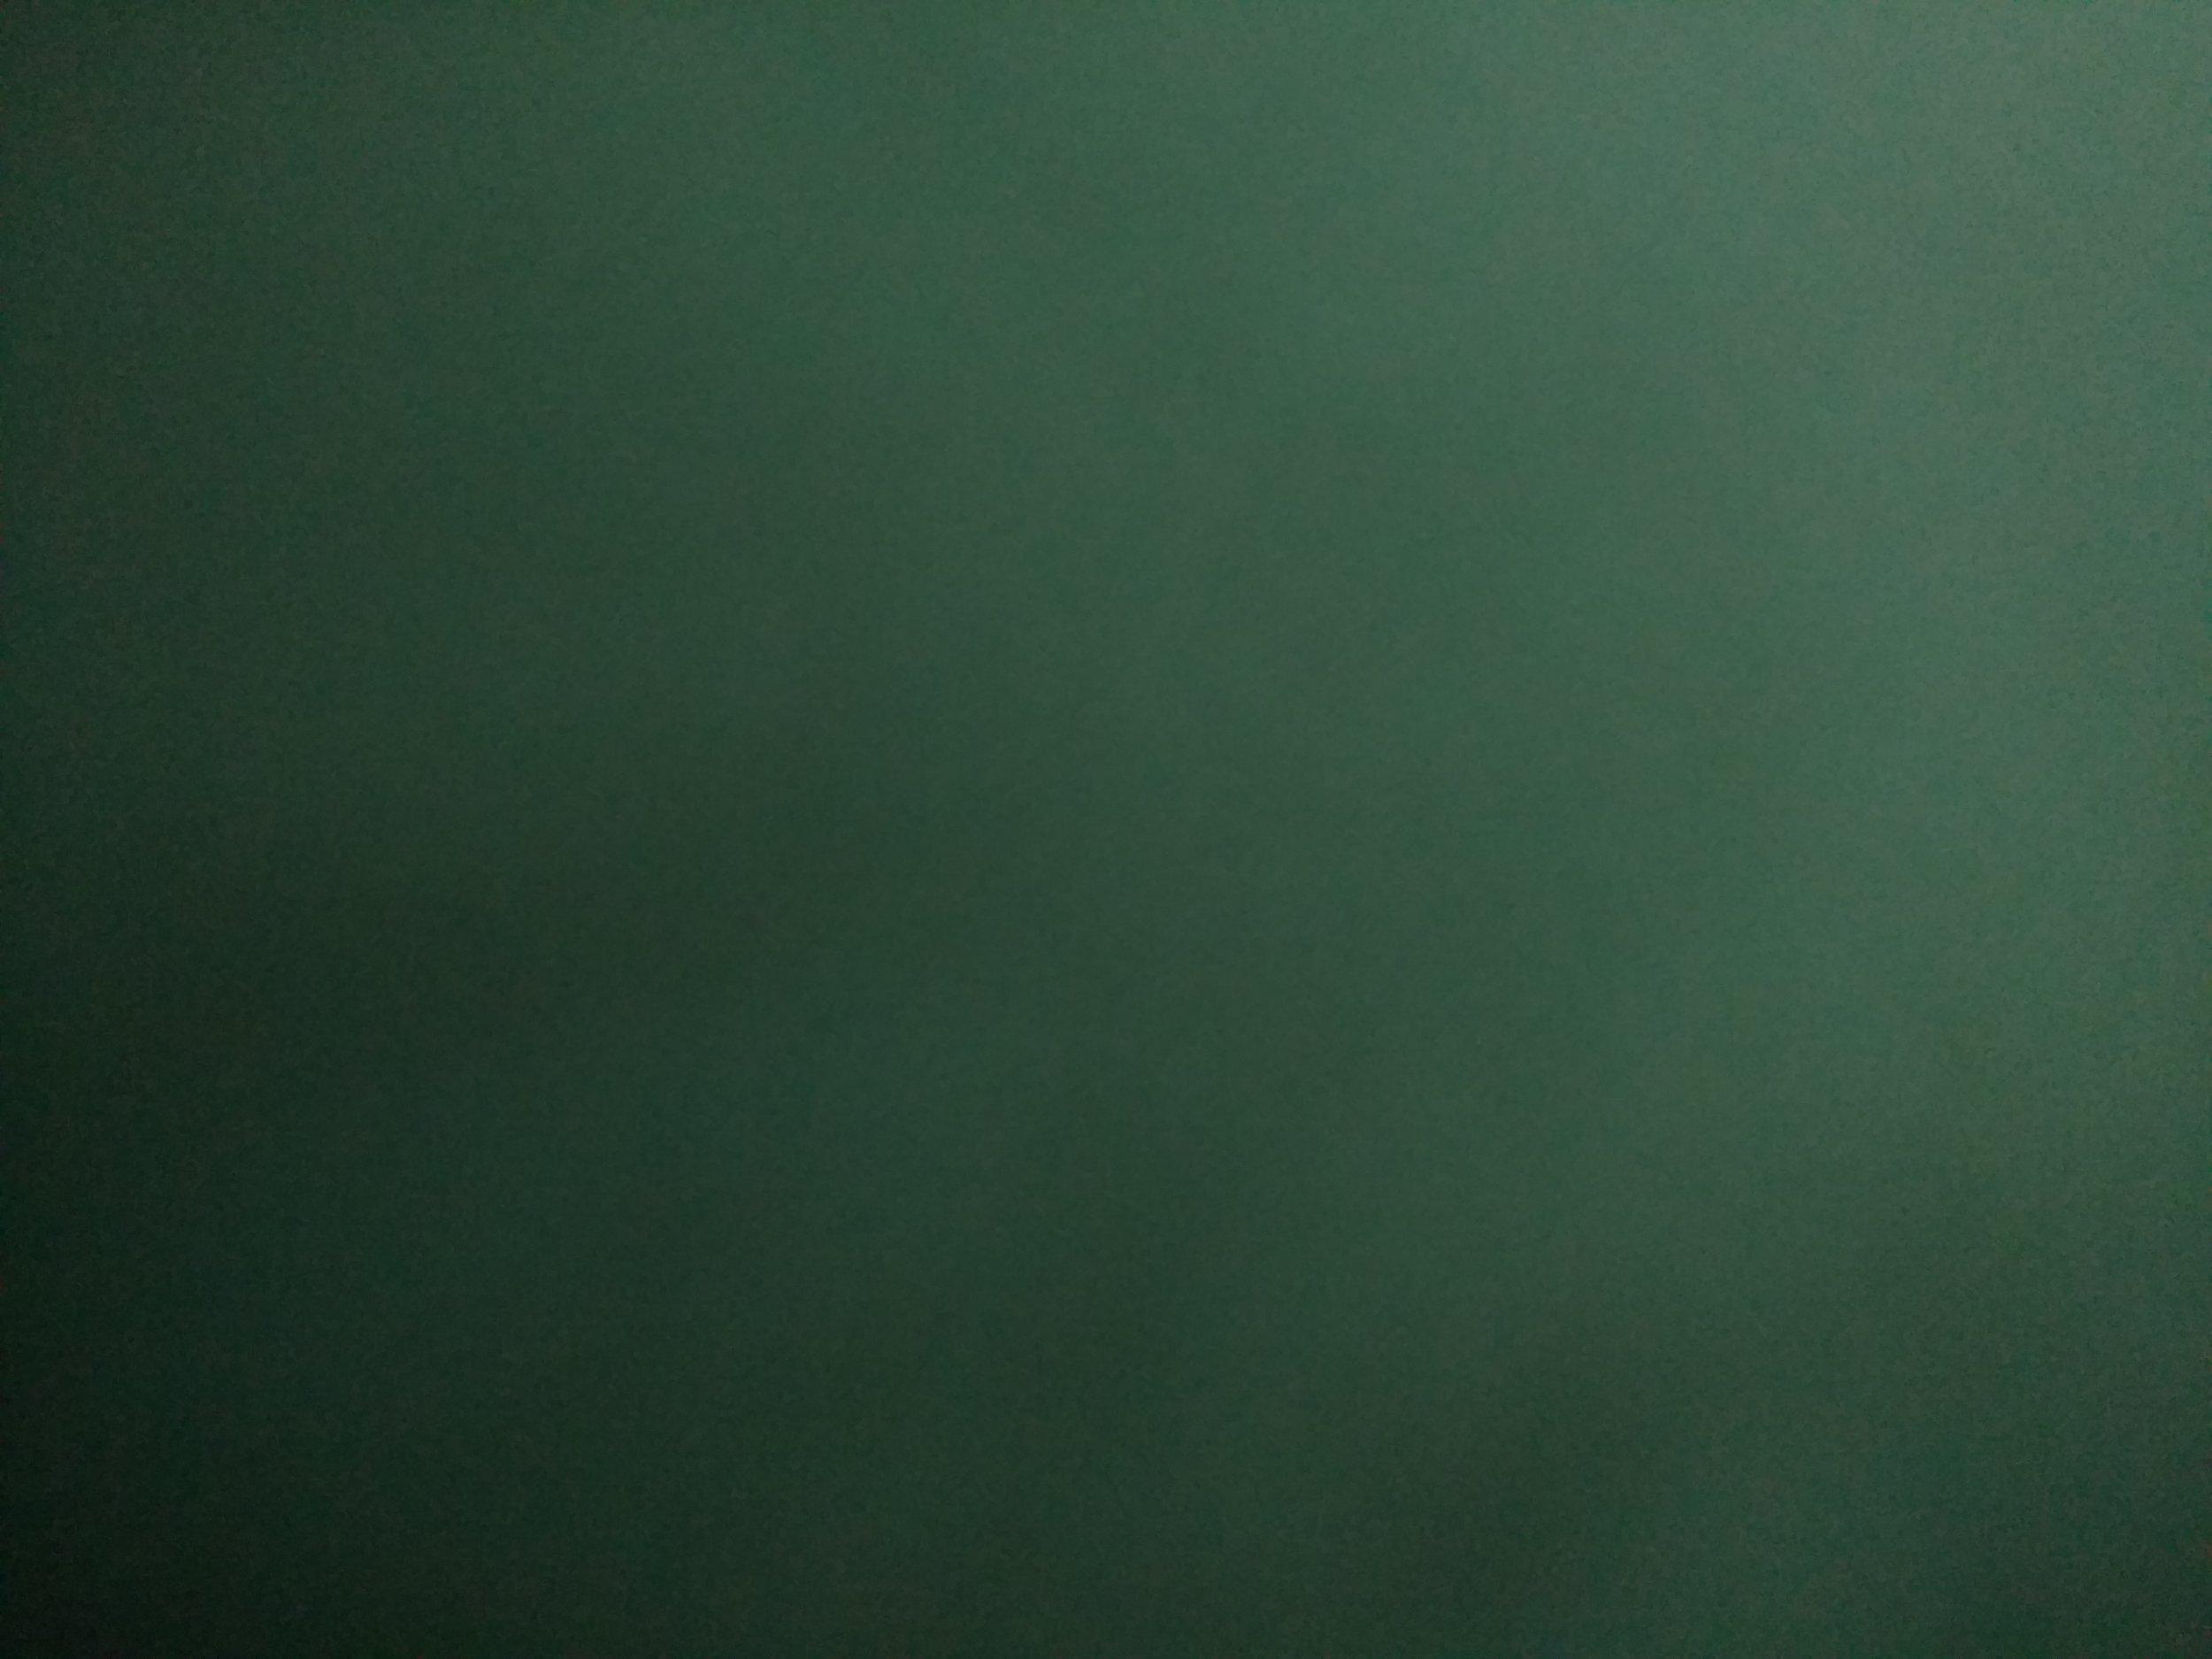 willroth-co-free-texture-gradient-035.jpg